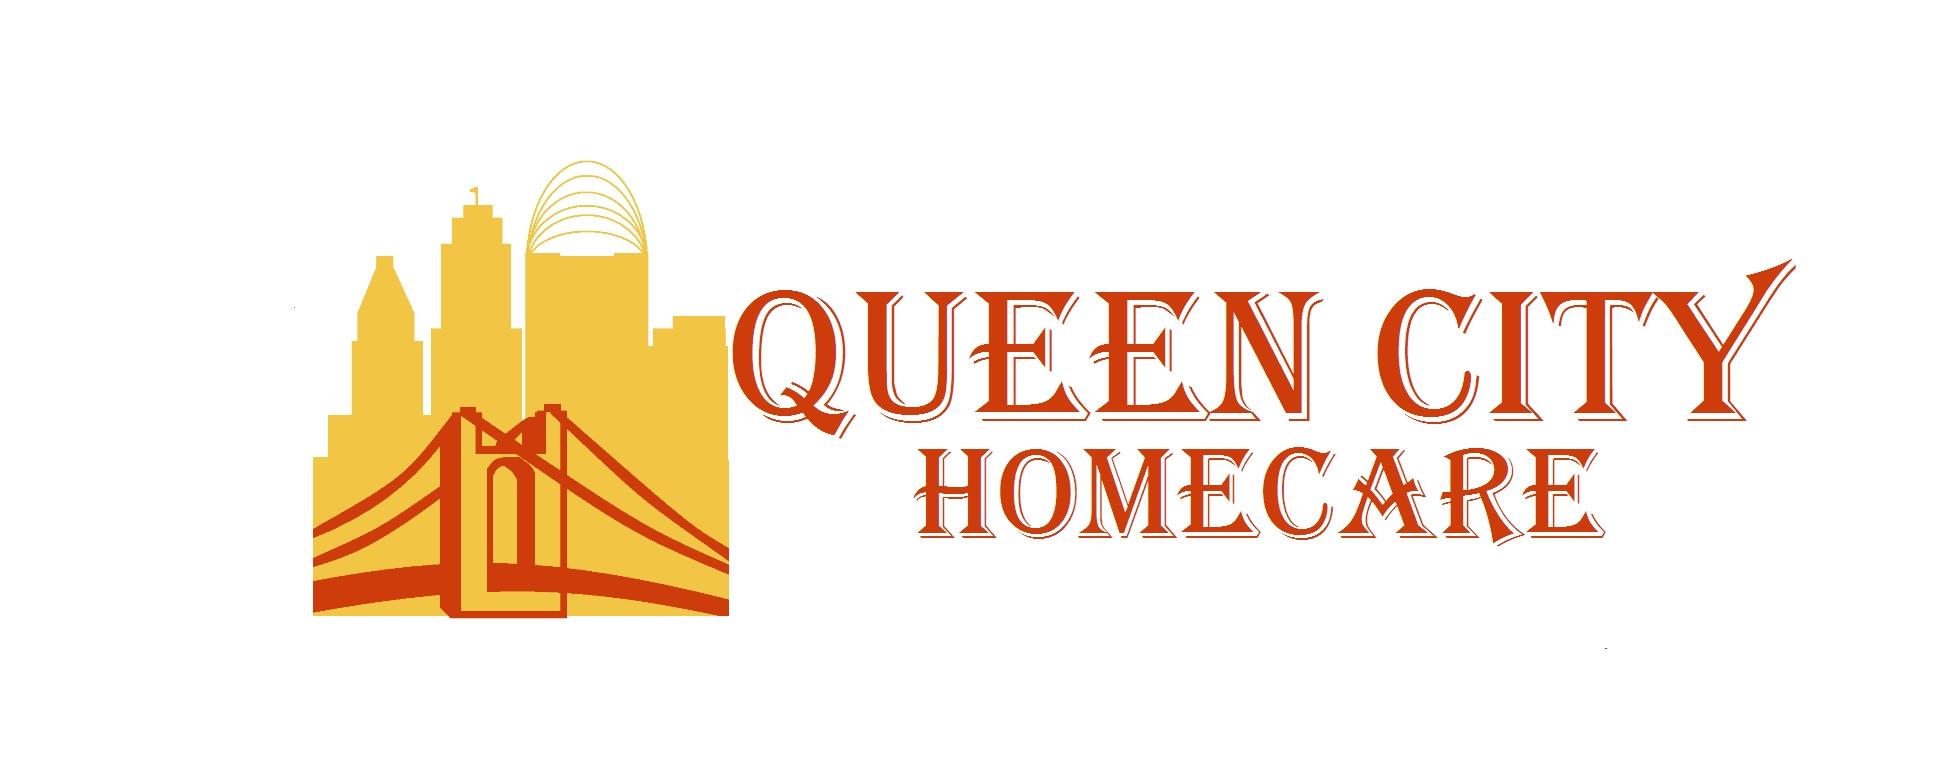 Queen City Homecare, LLC logo